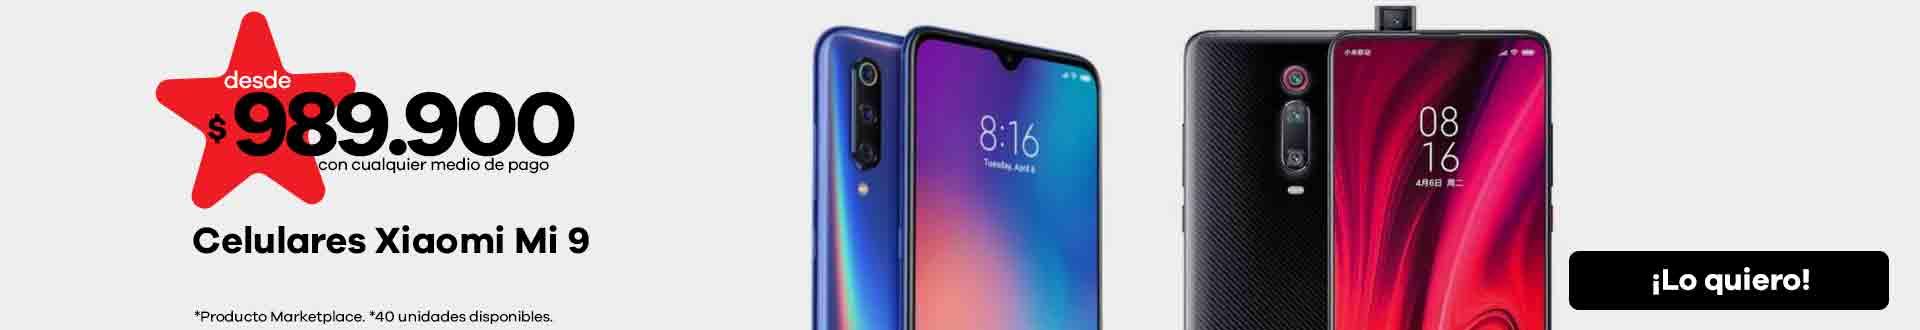 Celulares Xiaomi Mi 9